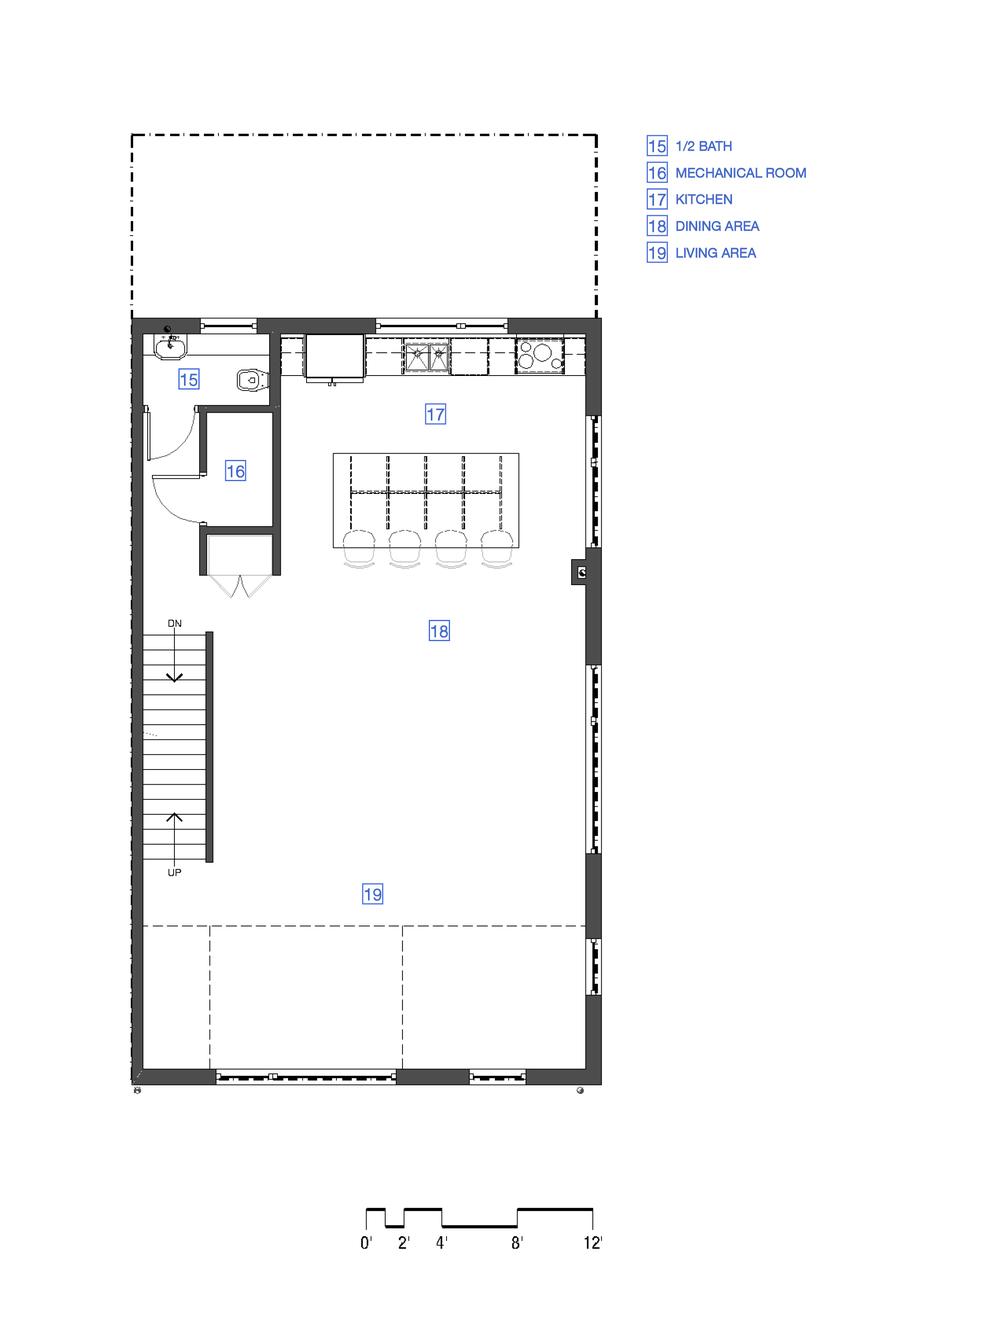 2nd Floor - Unit 'B'